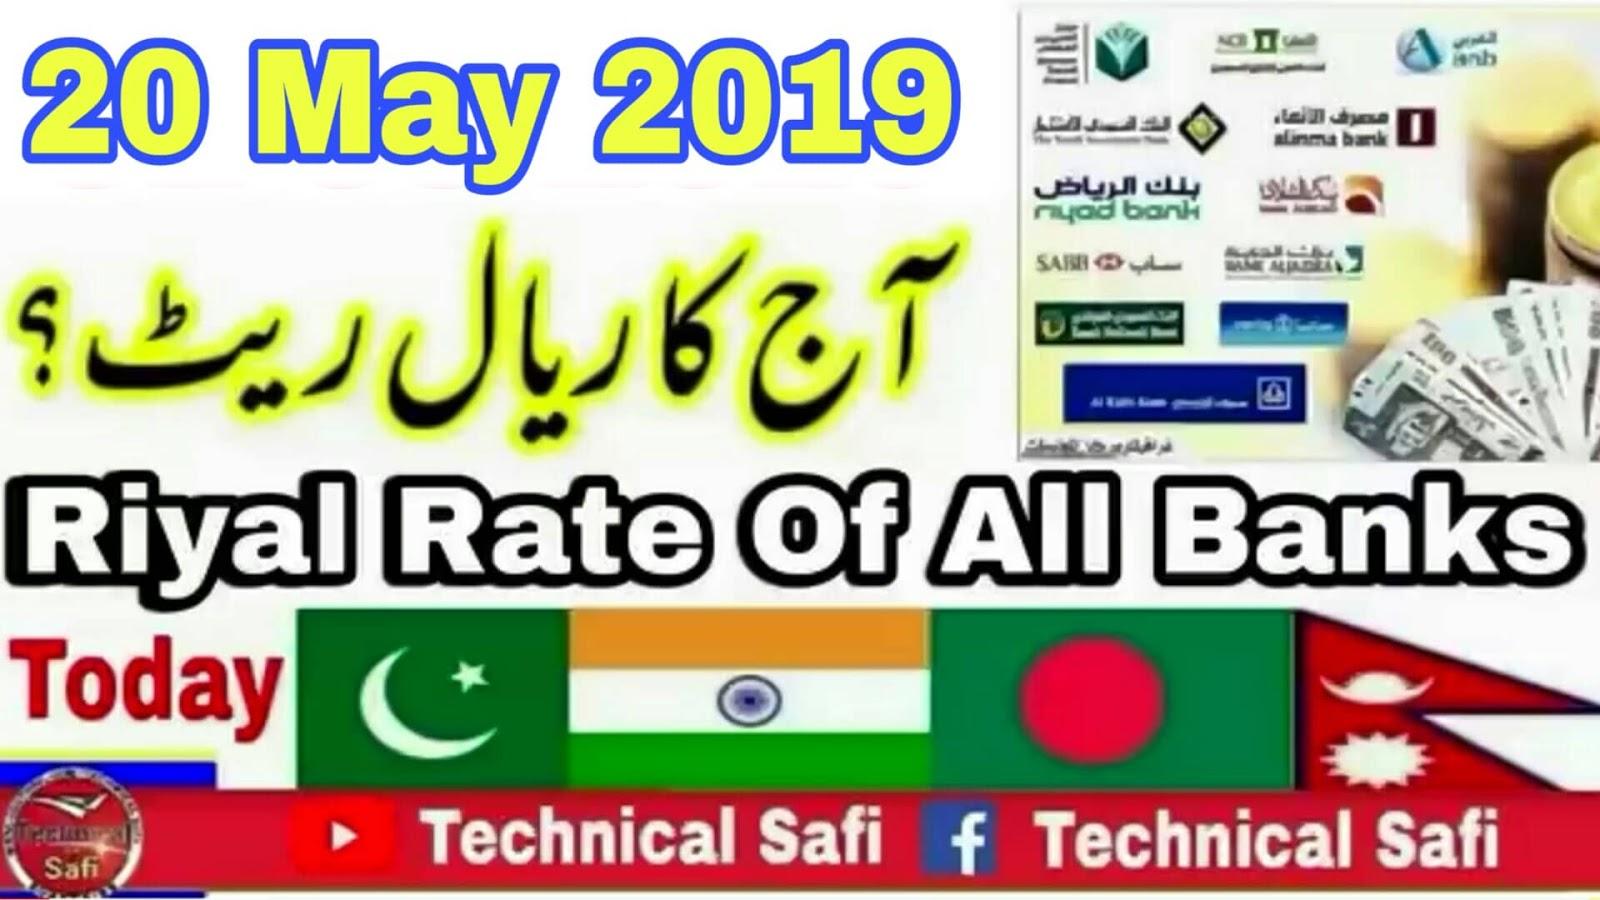 Saudi Riyal Rate Today In Stan